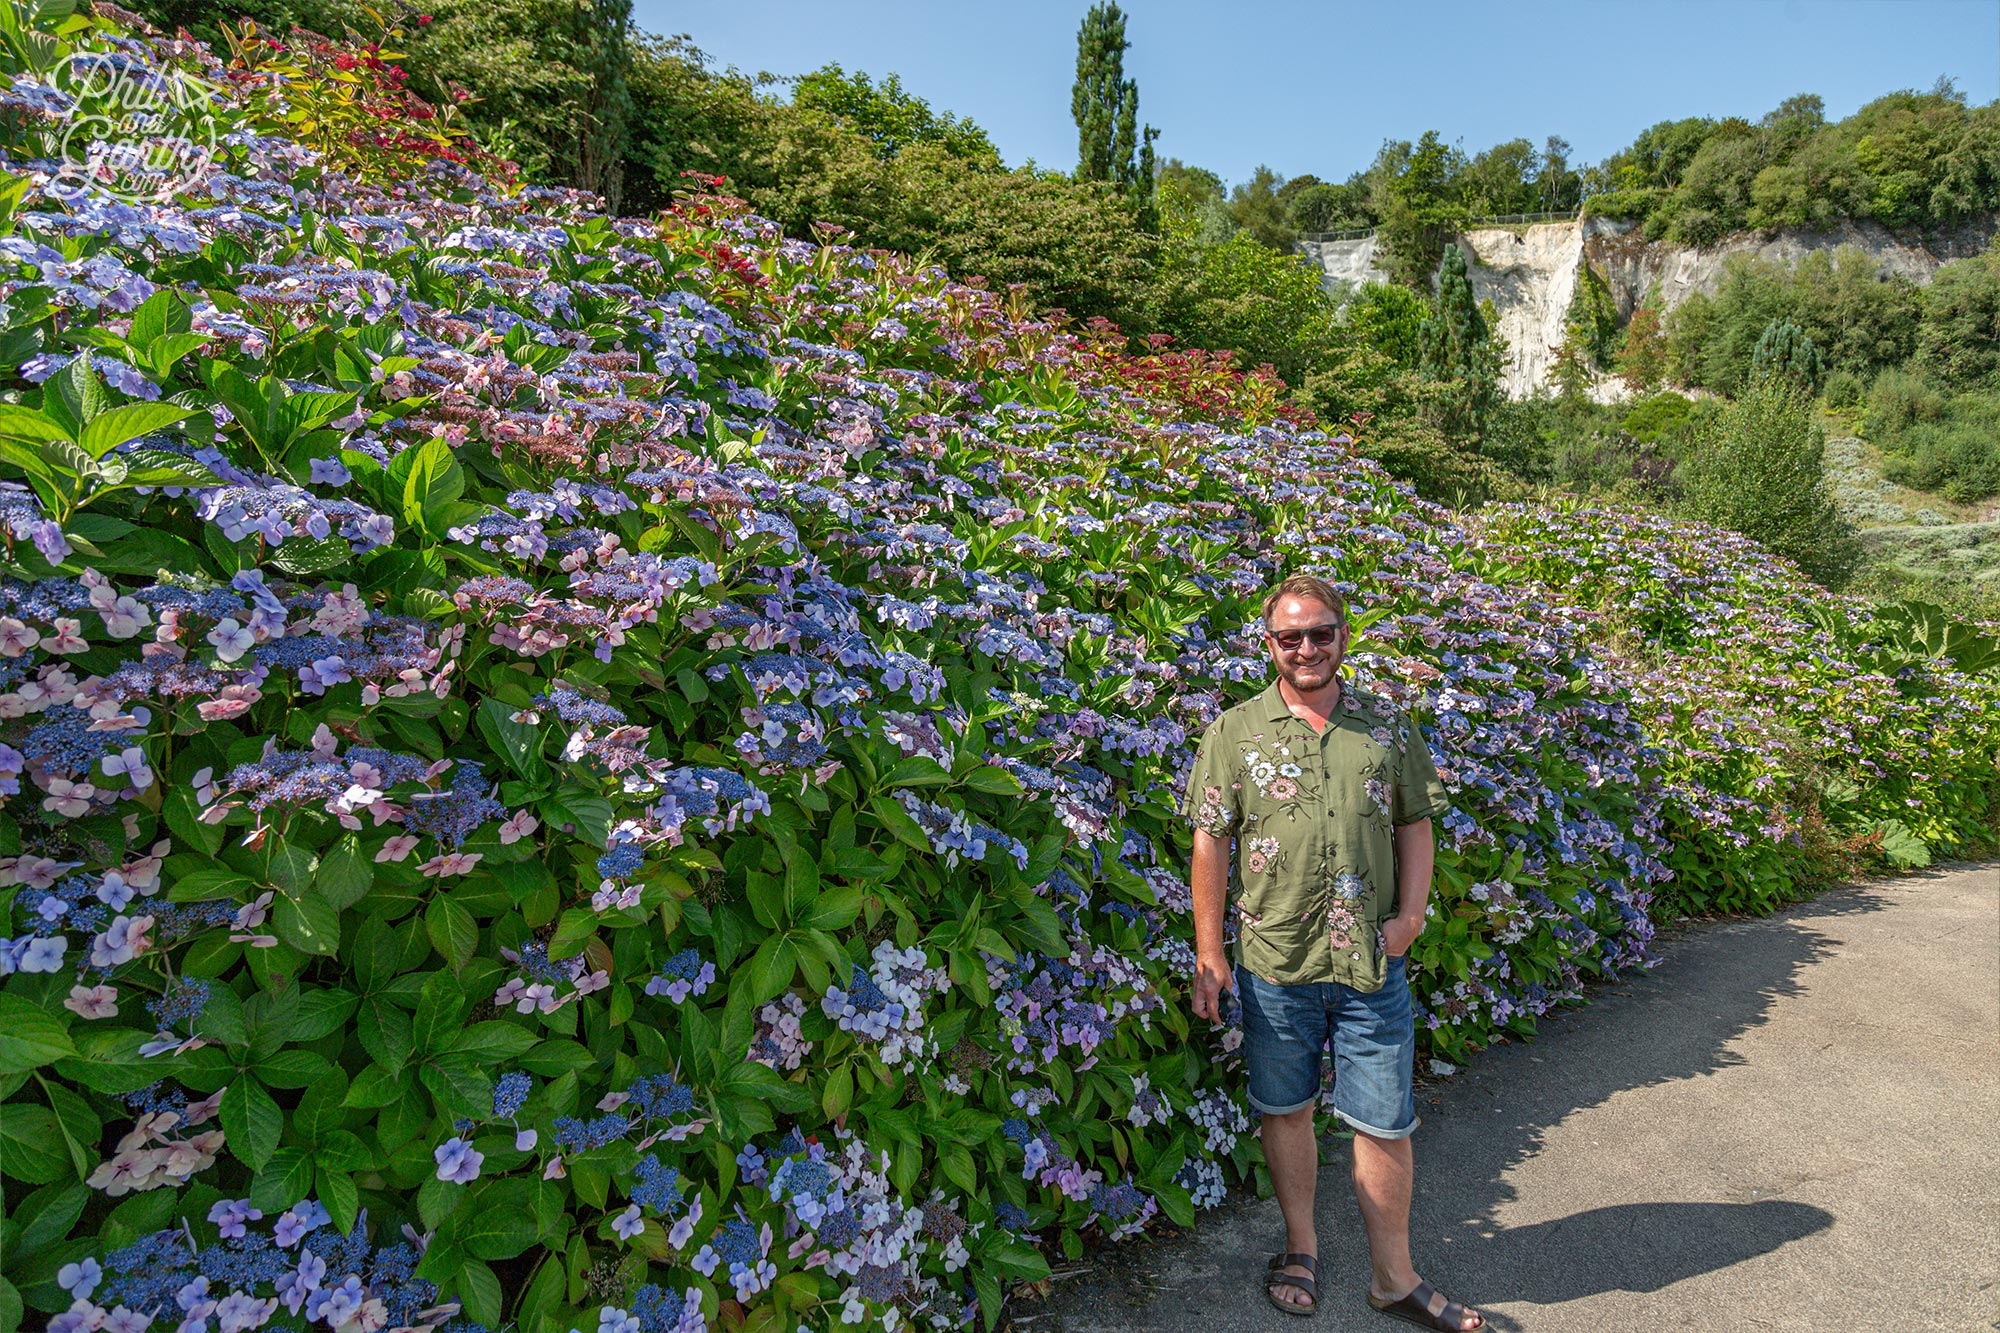 Garth stood next to this striking hydrangea border